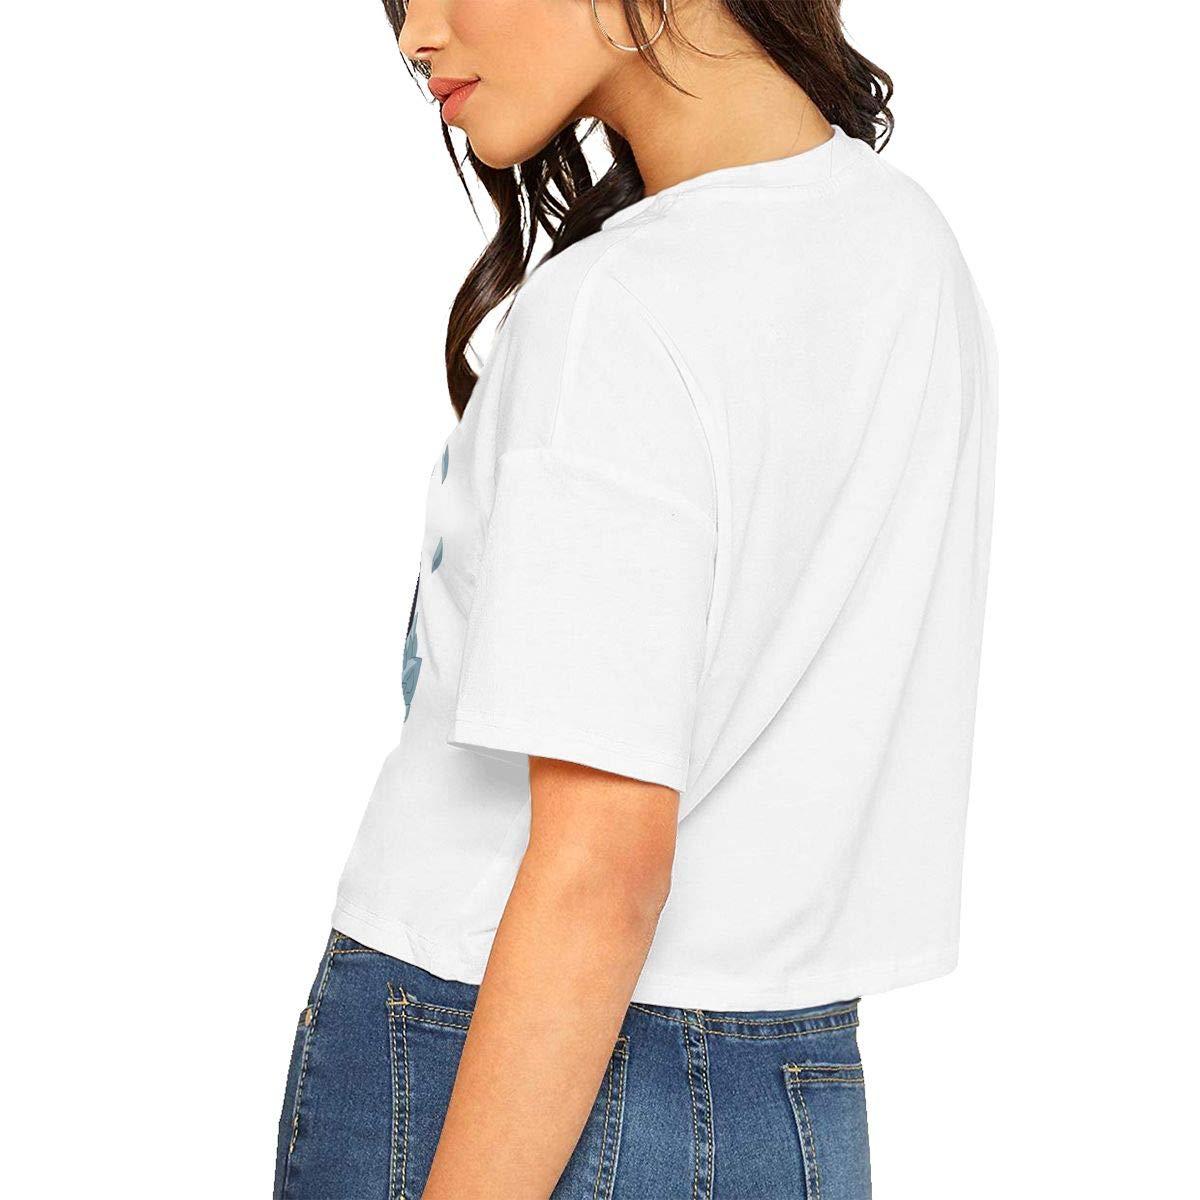 BROOKE Woman Fashion Personalized Sans Top Midriff Tshirts Black